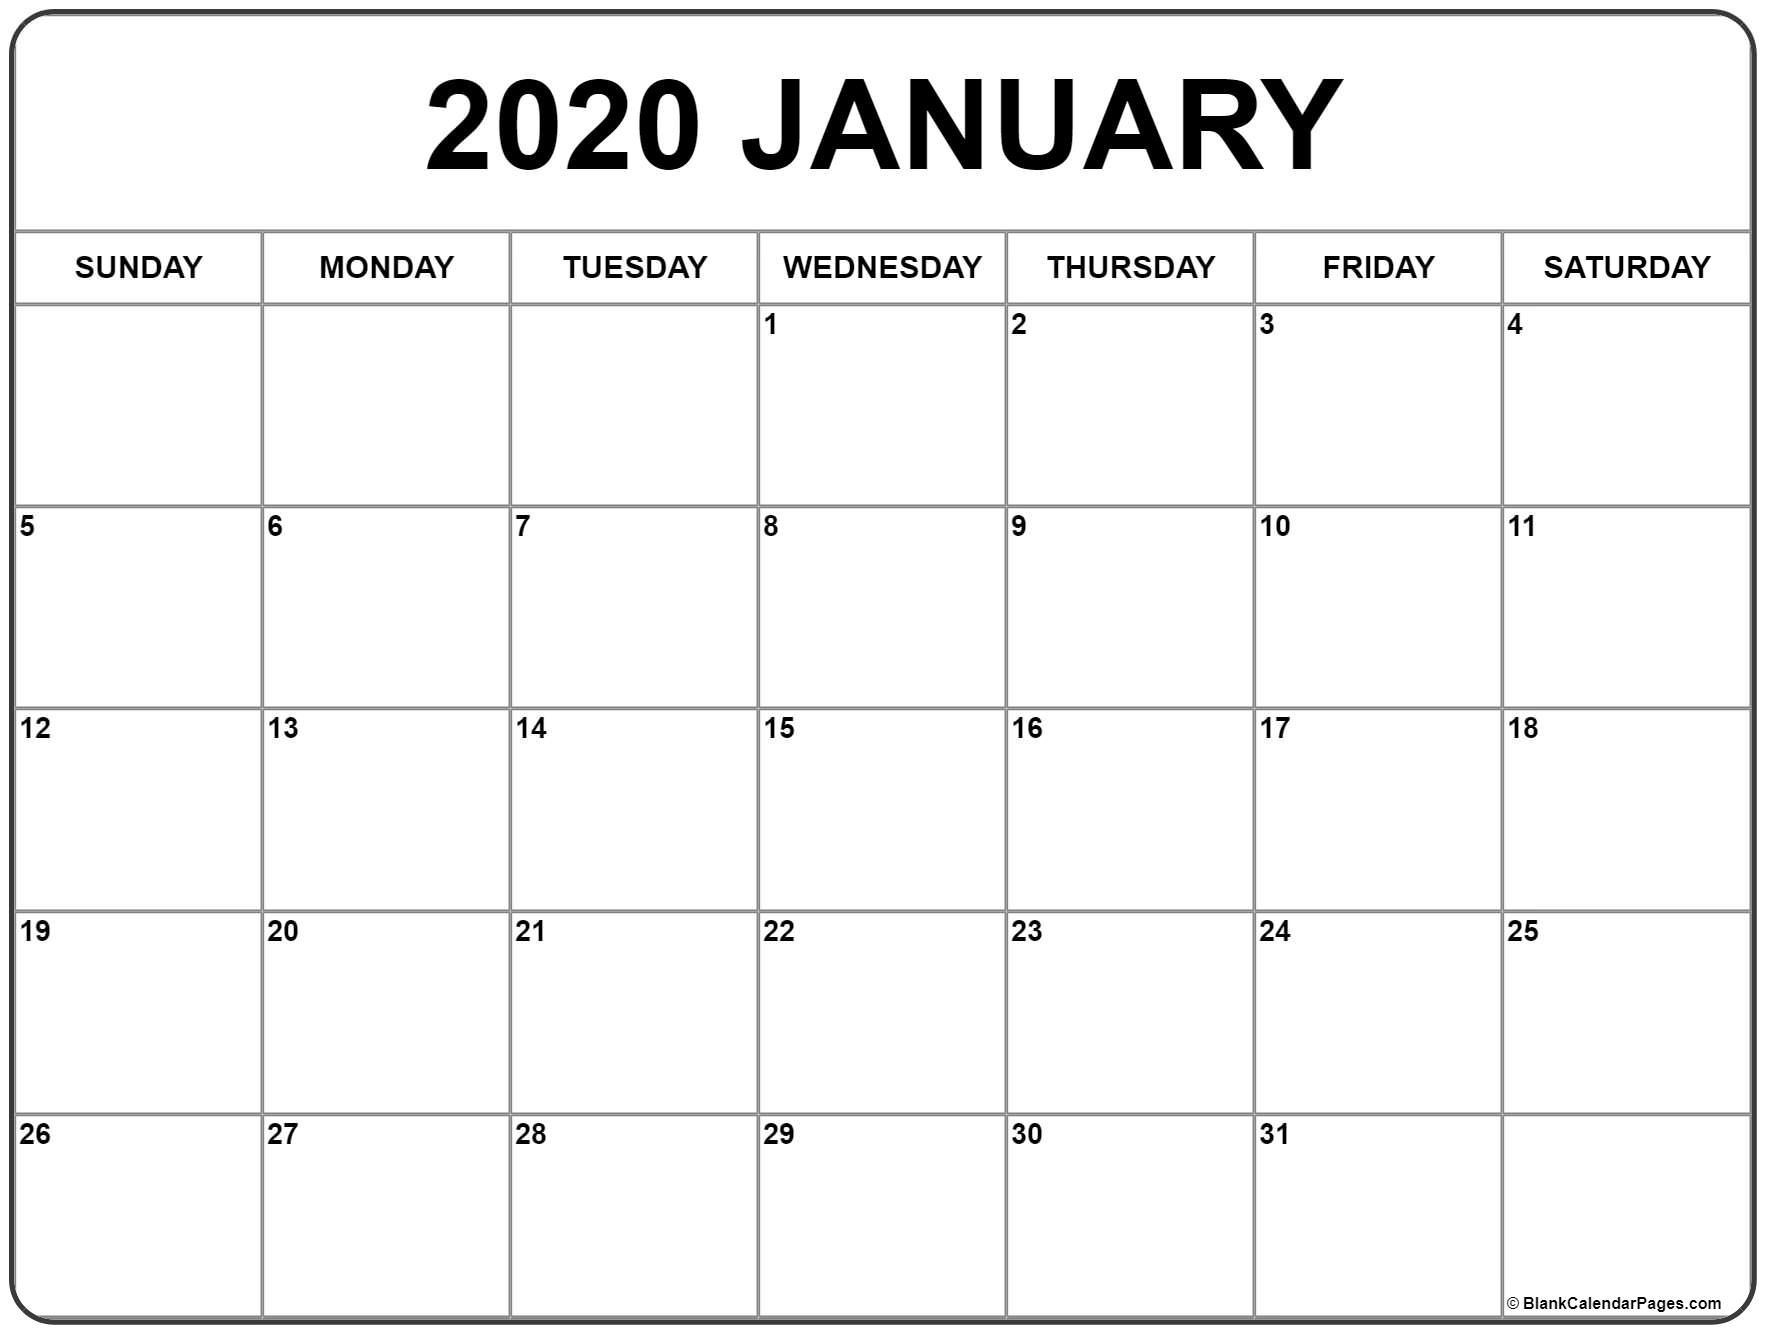 January 2020 Calendar | Free Printable Monthly Calendars-January 2020 Fillable Calendar